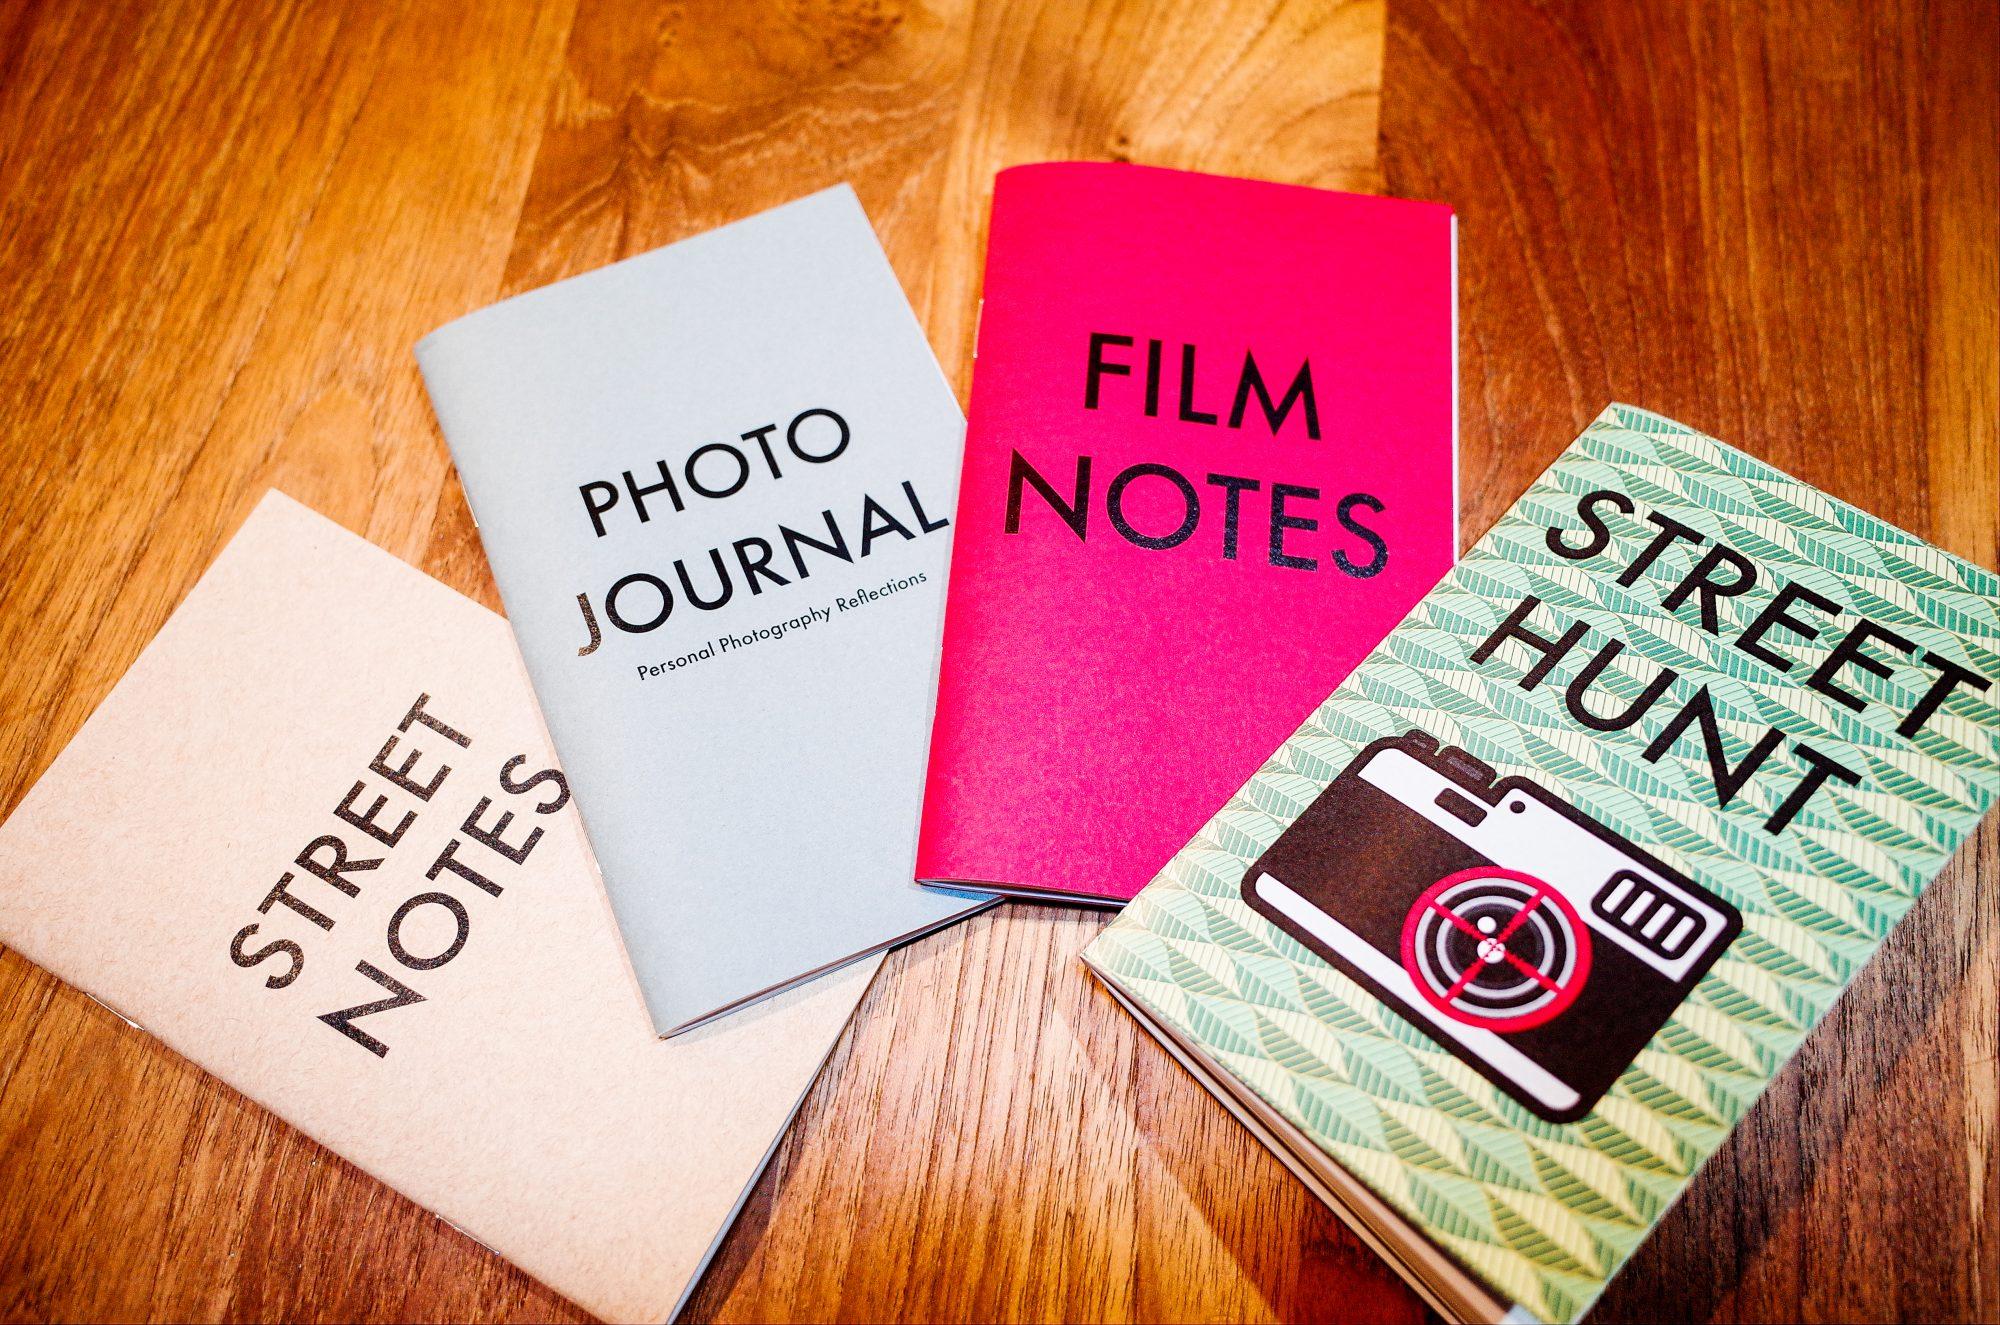 STREET NOTES, PHOTO JOURNAL, FILM NOTES, STREET HUNT